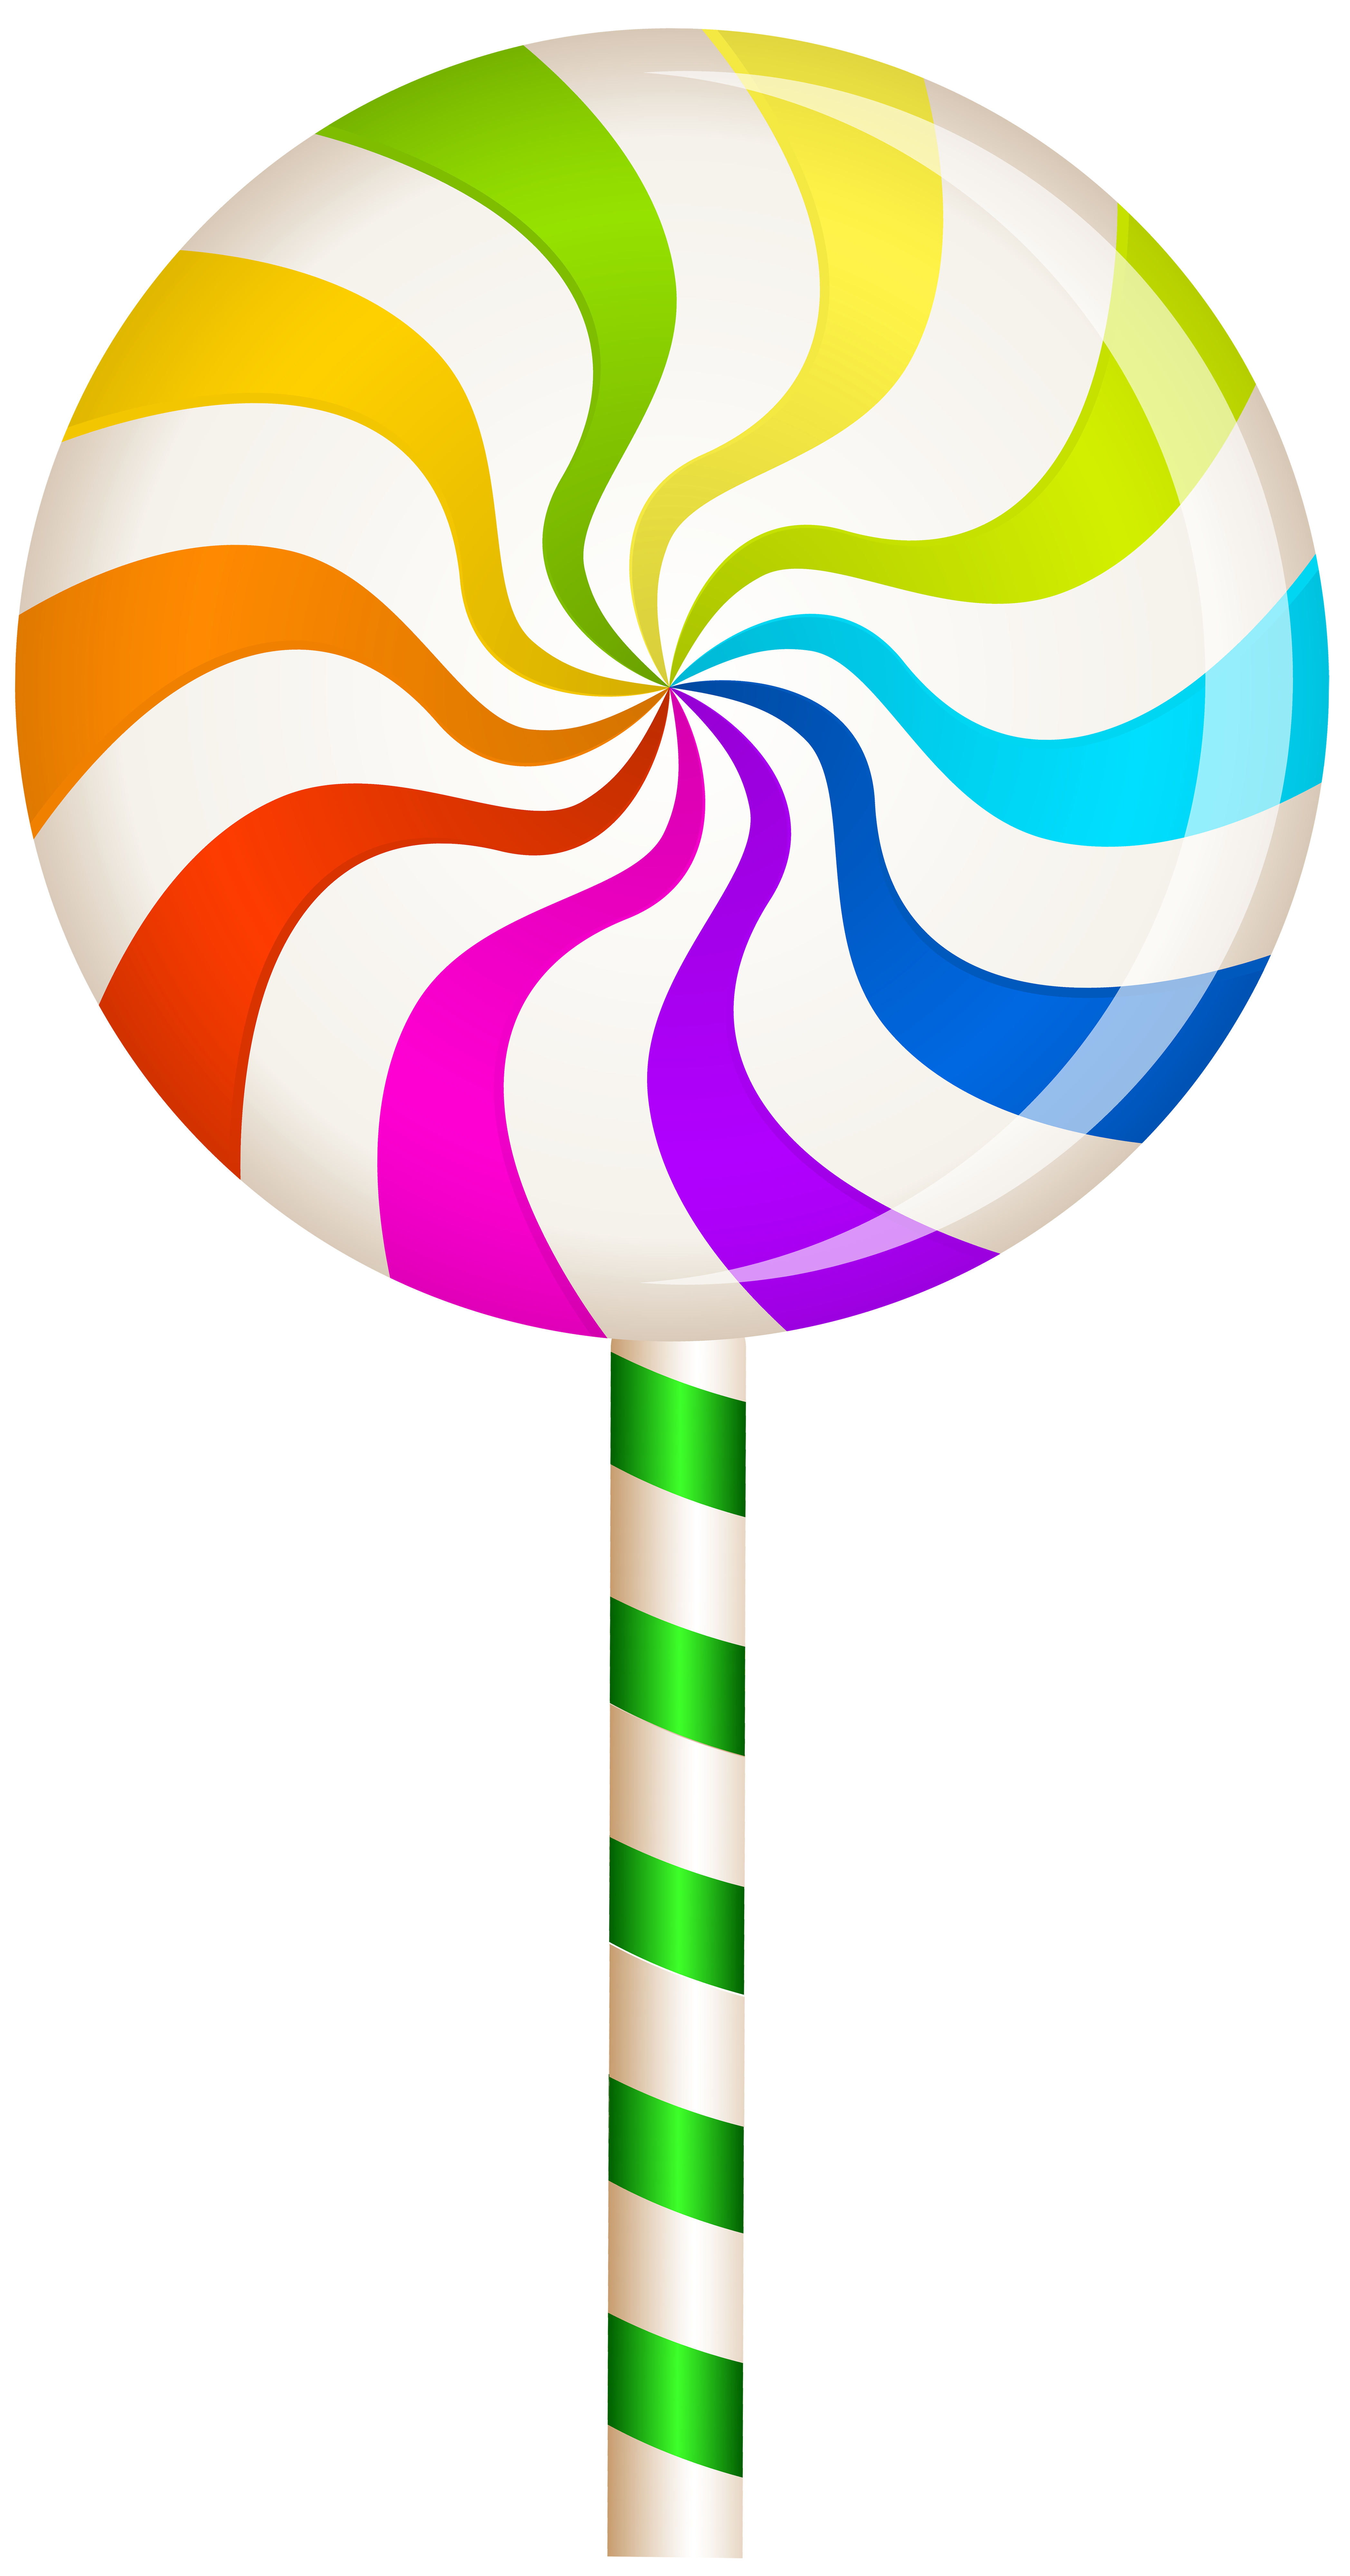 black and white Multicolor Swirl Lollipop PNG Clip Art Image